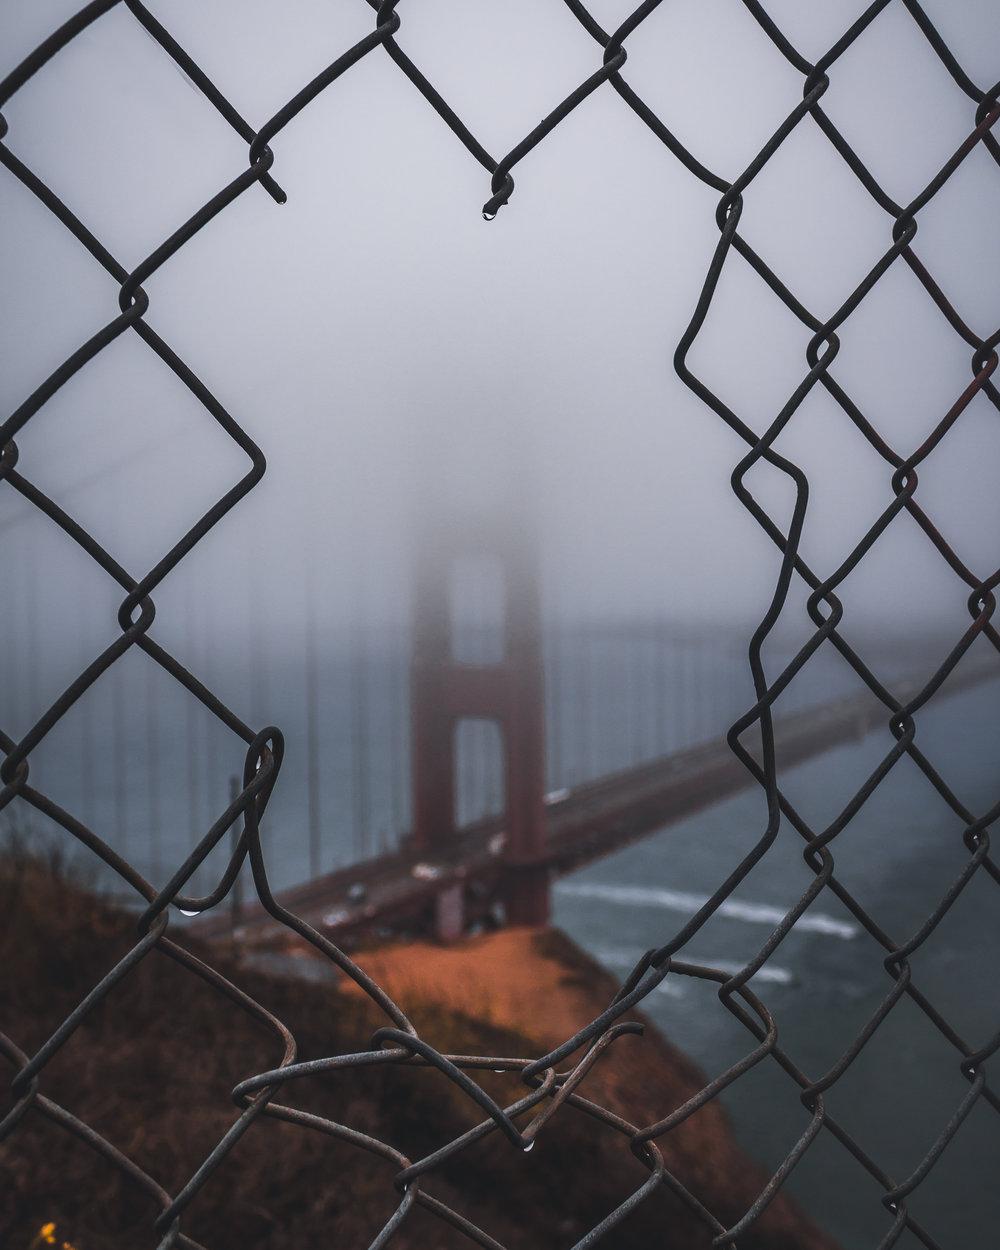 TREVOR DUARTE | PHOTOGRAPHER - LANDSCAPE / CITY